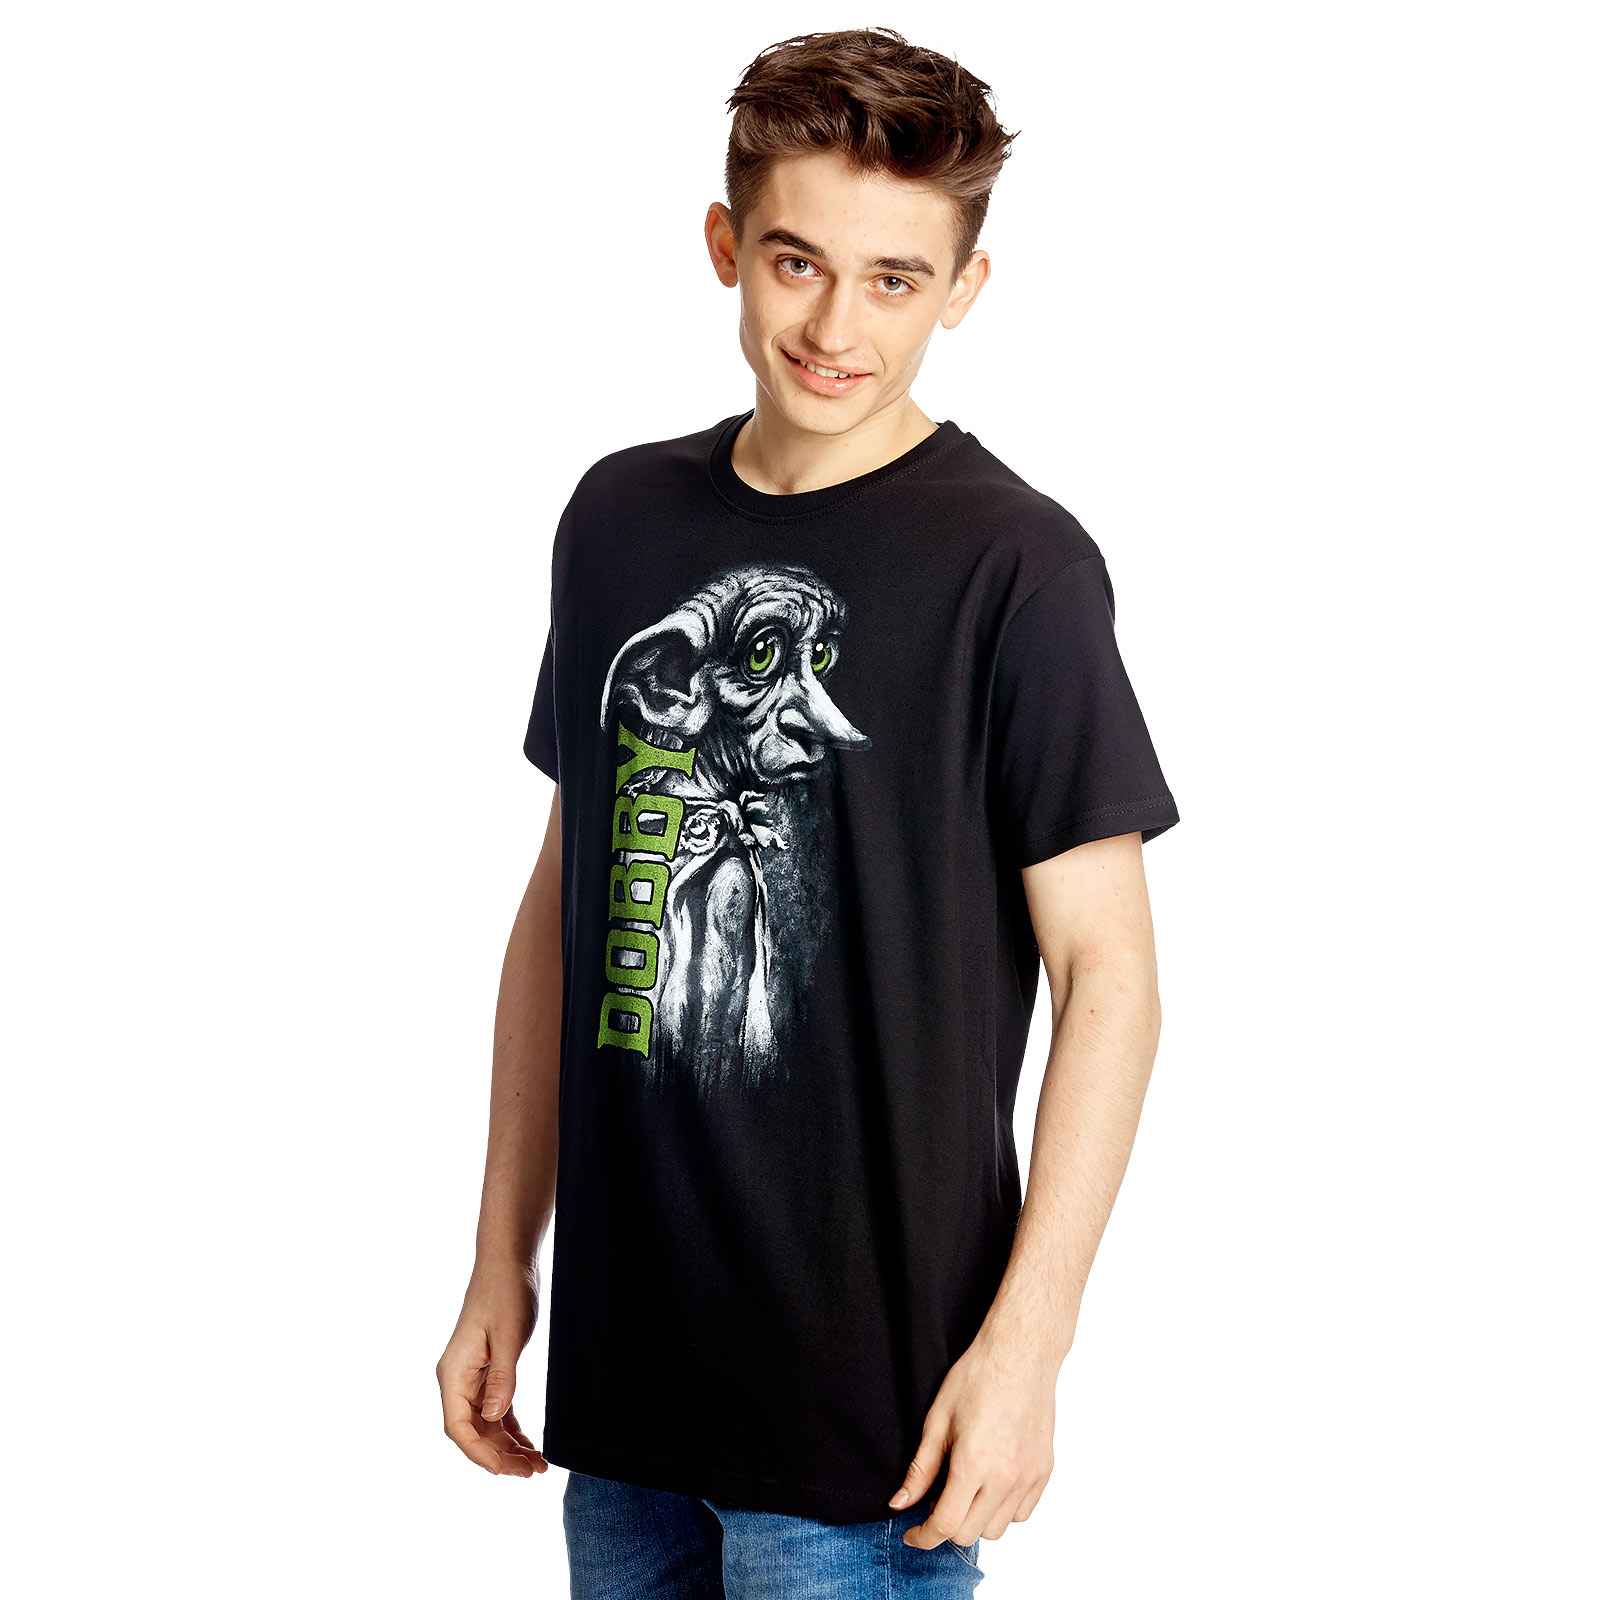 Harry Potter - Dobby Elf T-Shirt